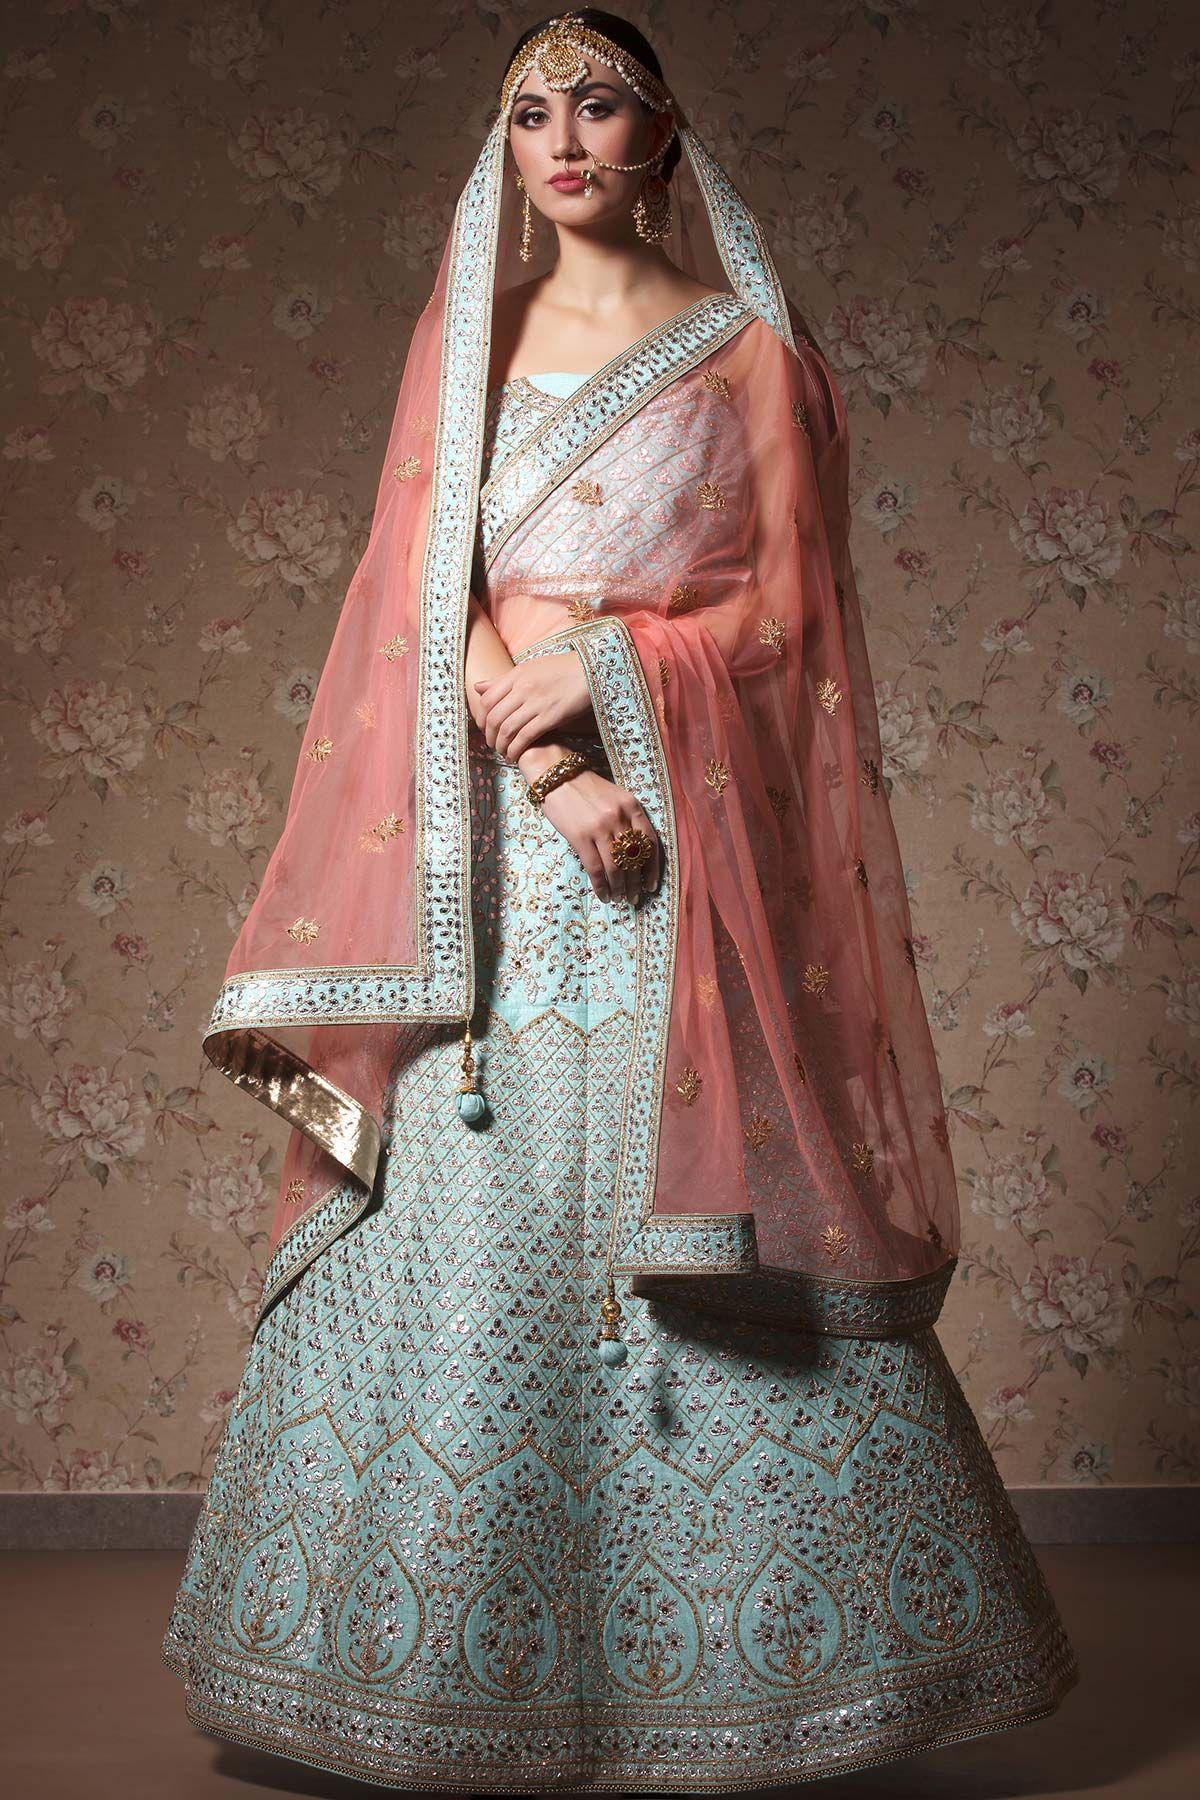 bec7b23e1d Krishna export pressent bollywood Fancy Exclusive bridal Lehenga Choli  Collection